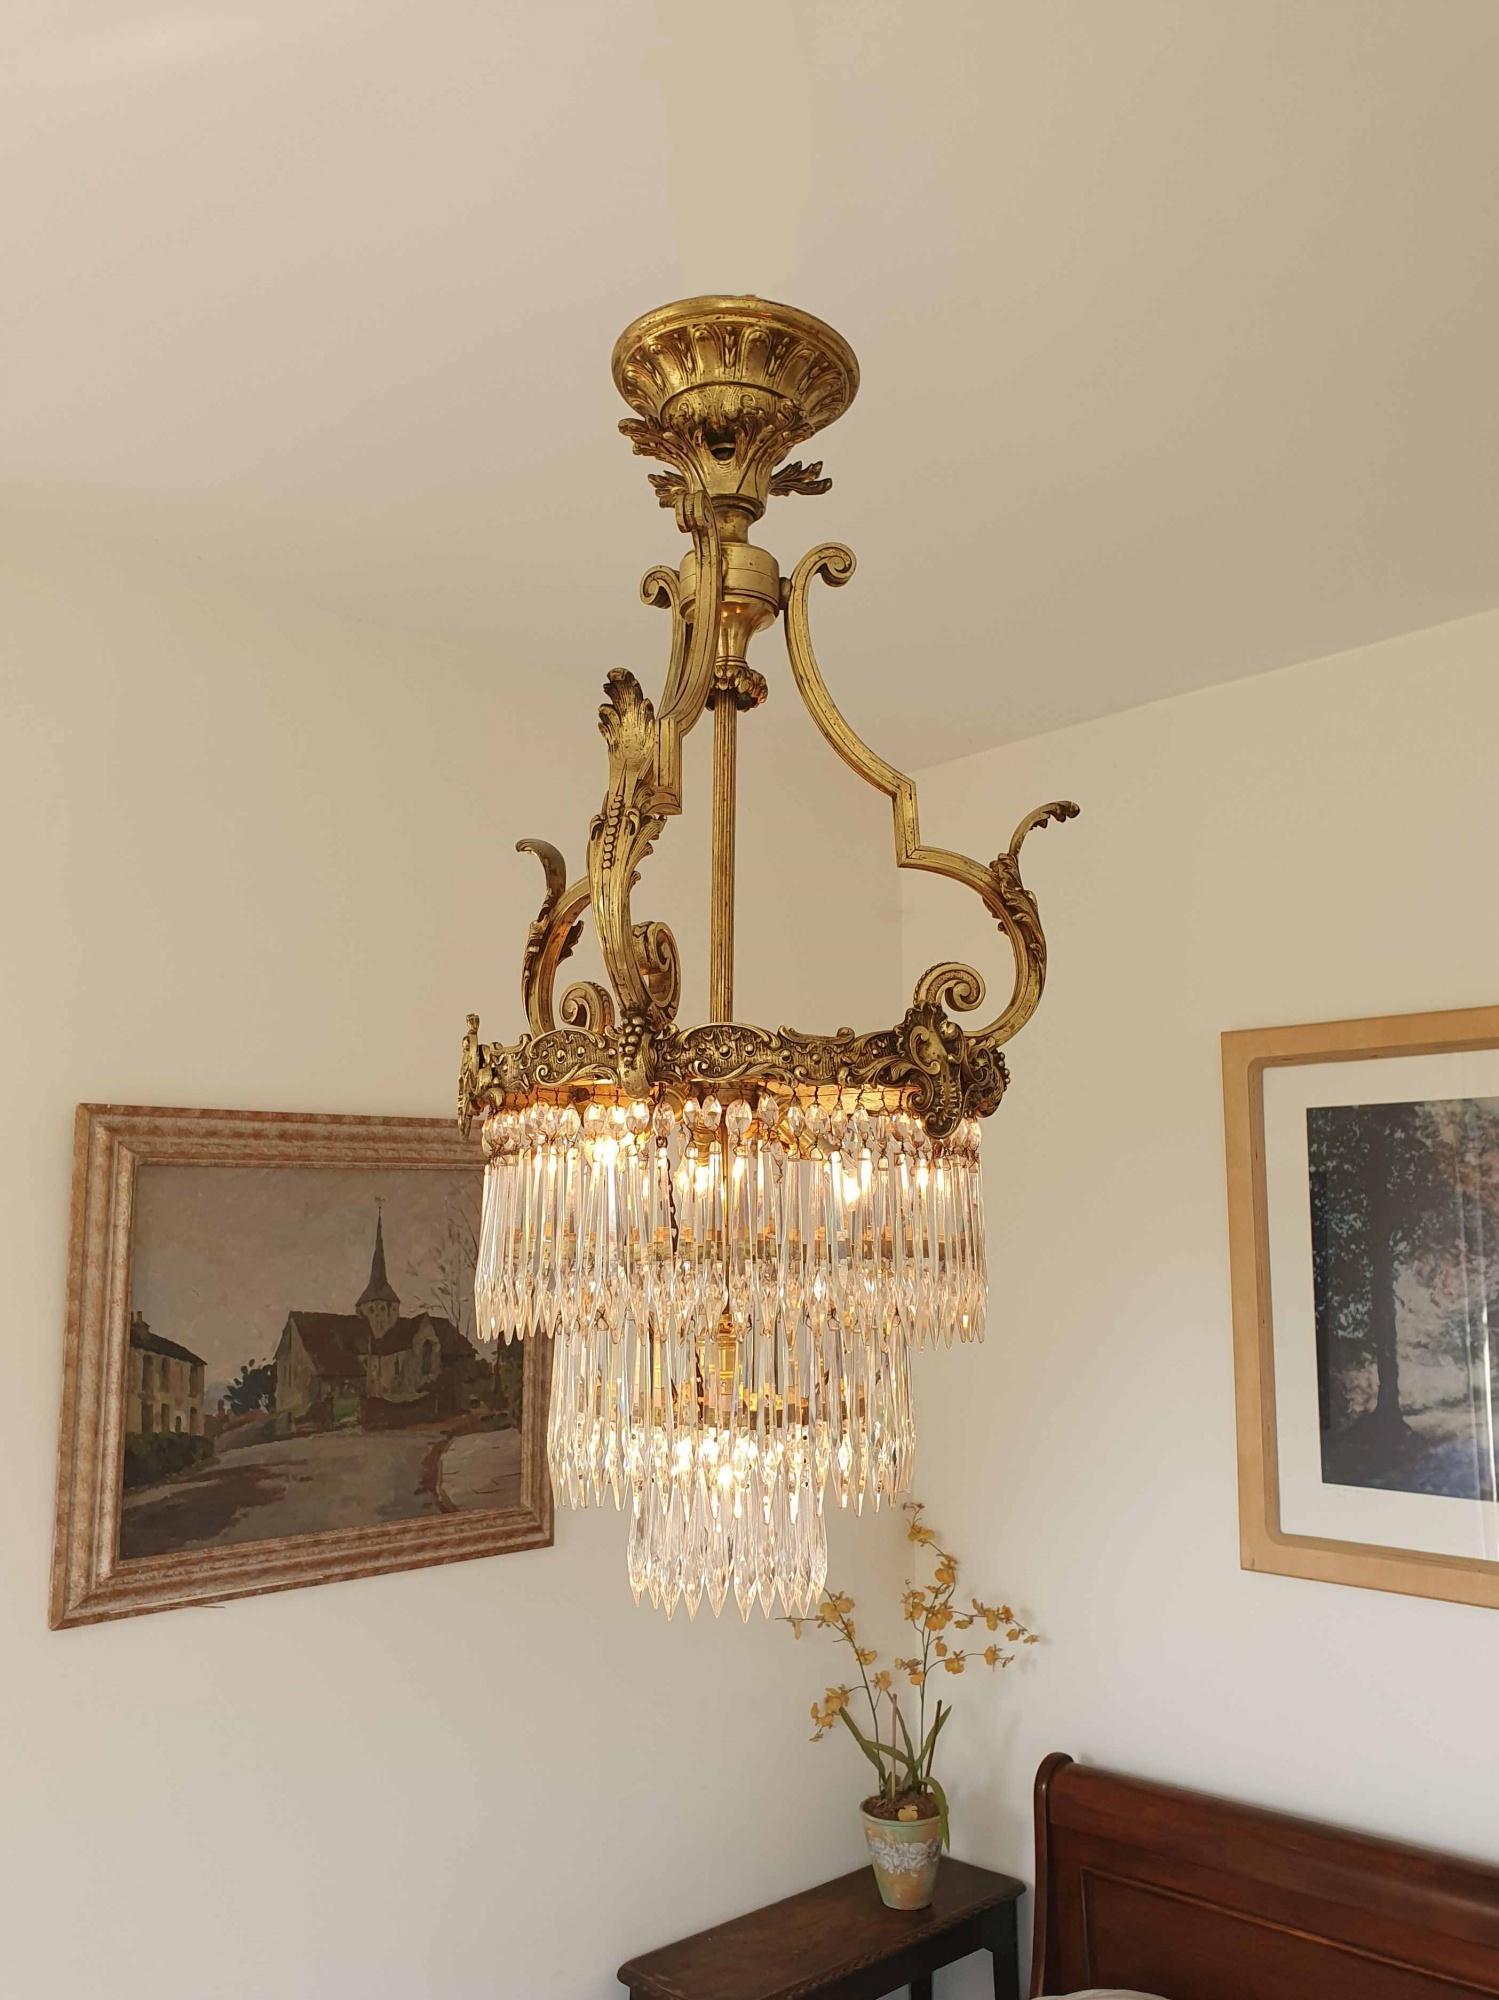 Fonderies De Bronze Nanterre Lyon Gilt Brass Glass Chandelier France Early C 20th Jones Antique Lighting